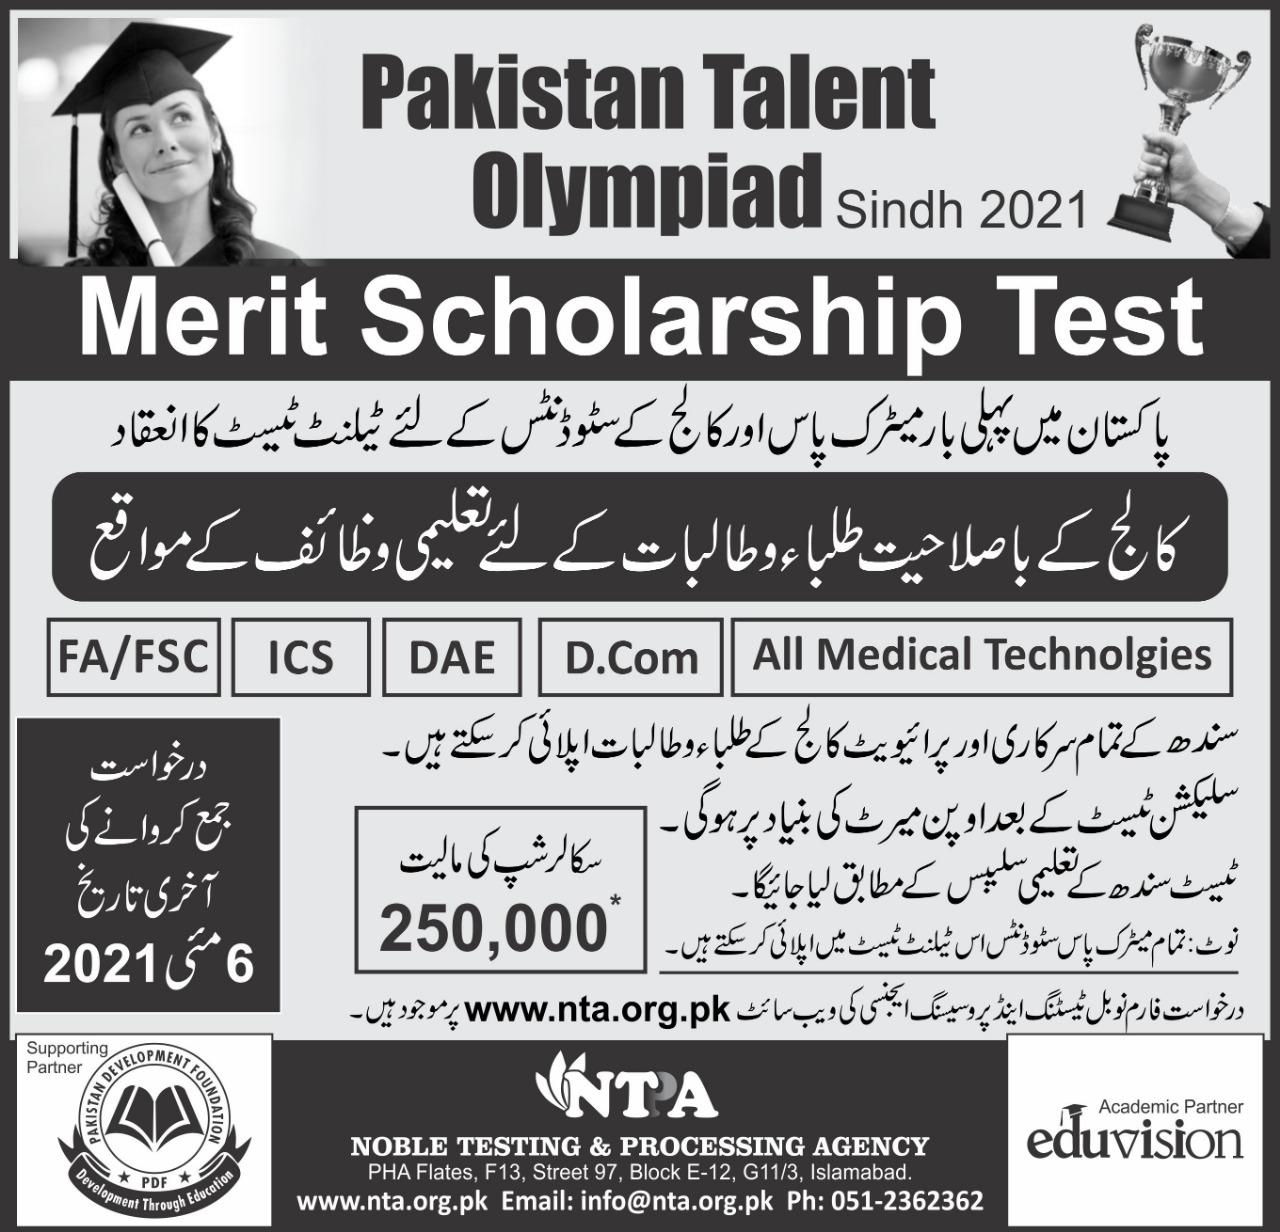 Pakistan Talent Olympiad Sindh Merit Scholarship 2021 NTPA Roll No Slip